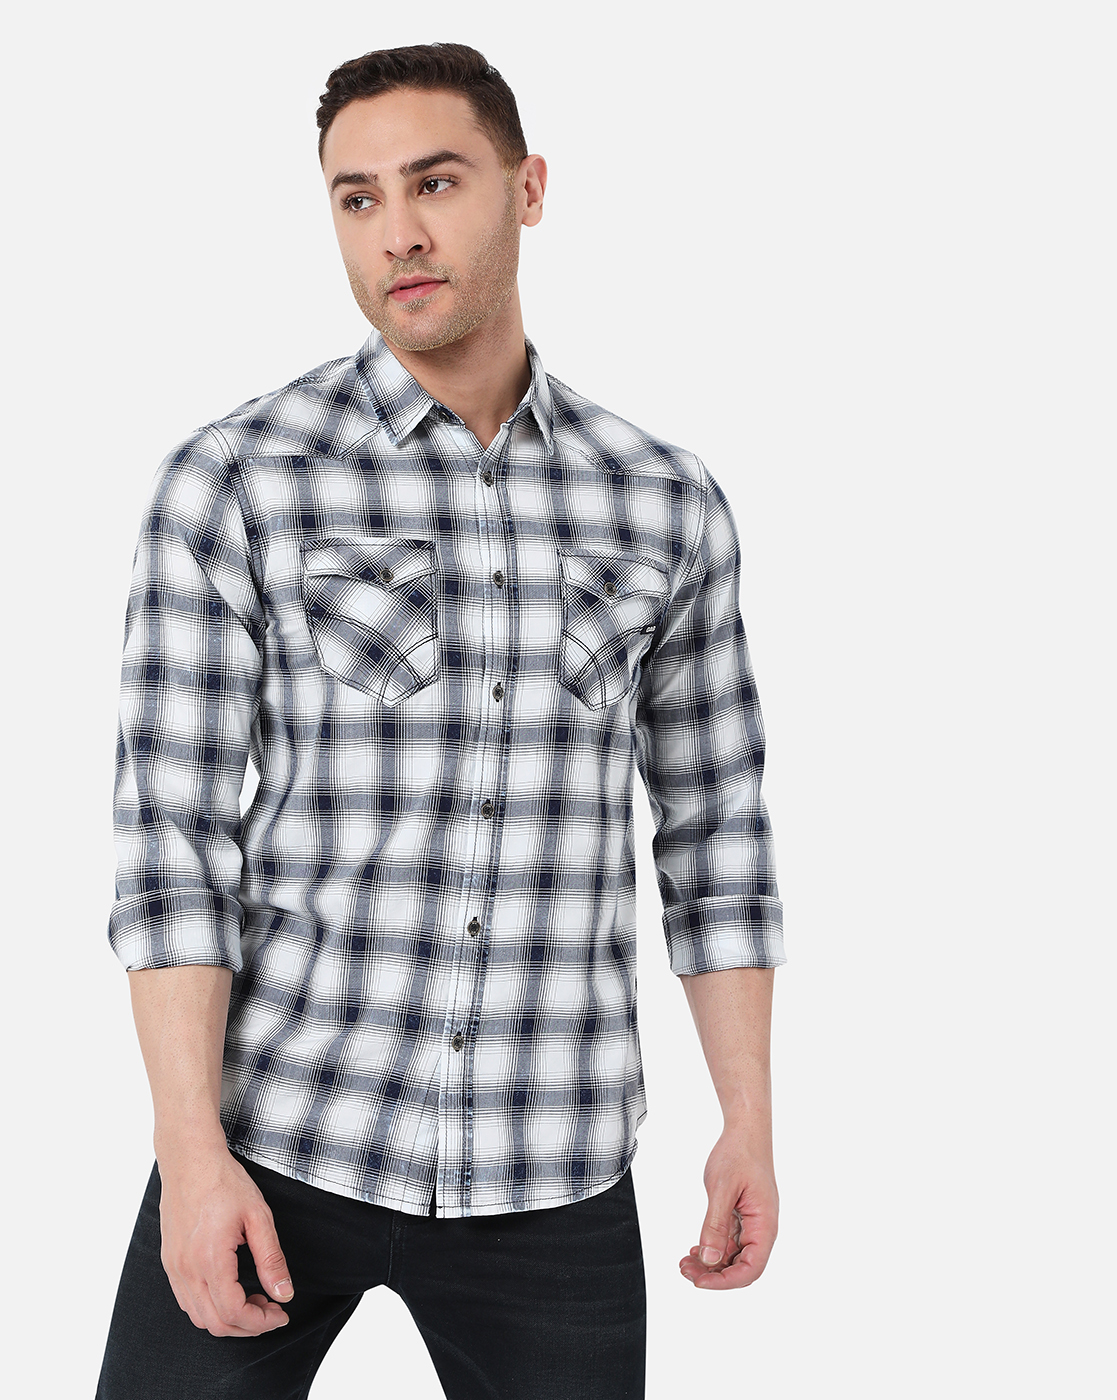 GAS | Men's Kant Ec In Slim Fit Checkered shirt